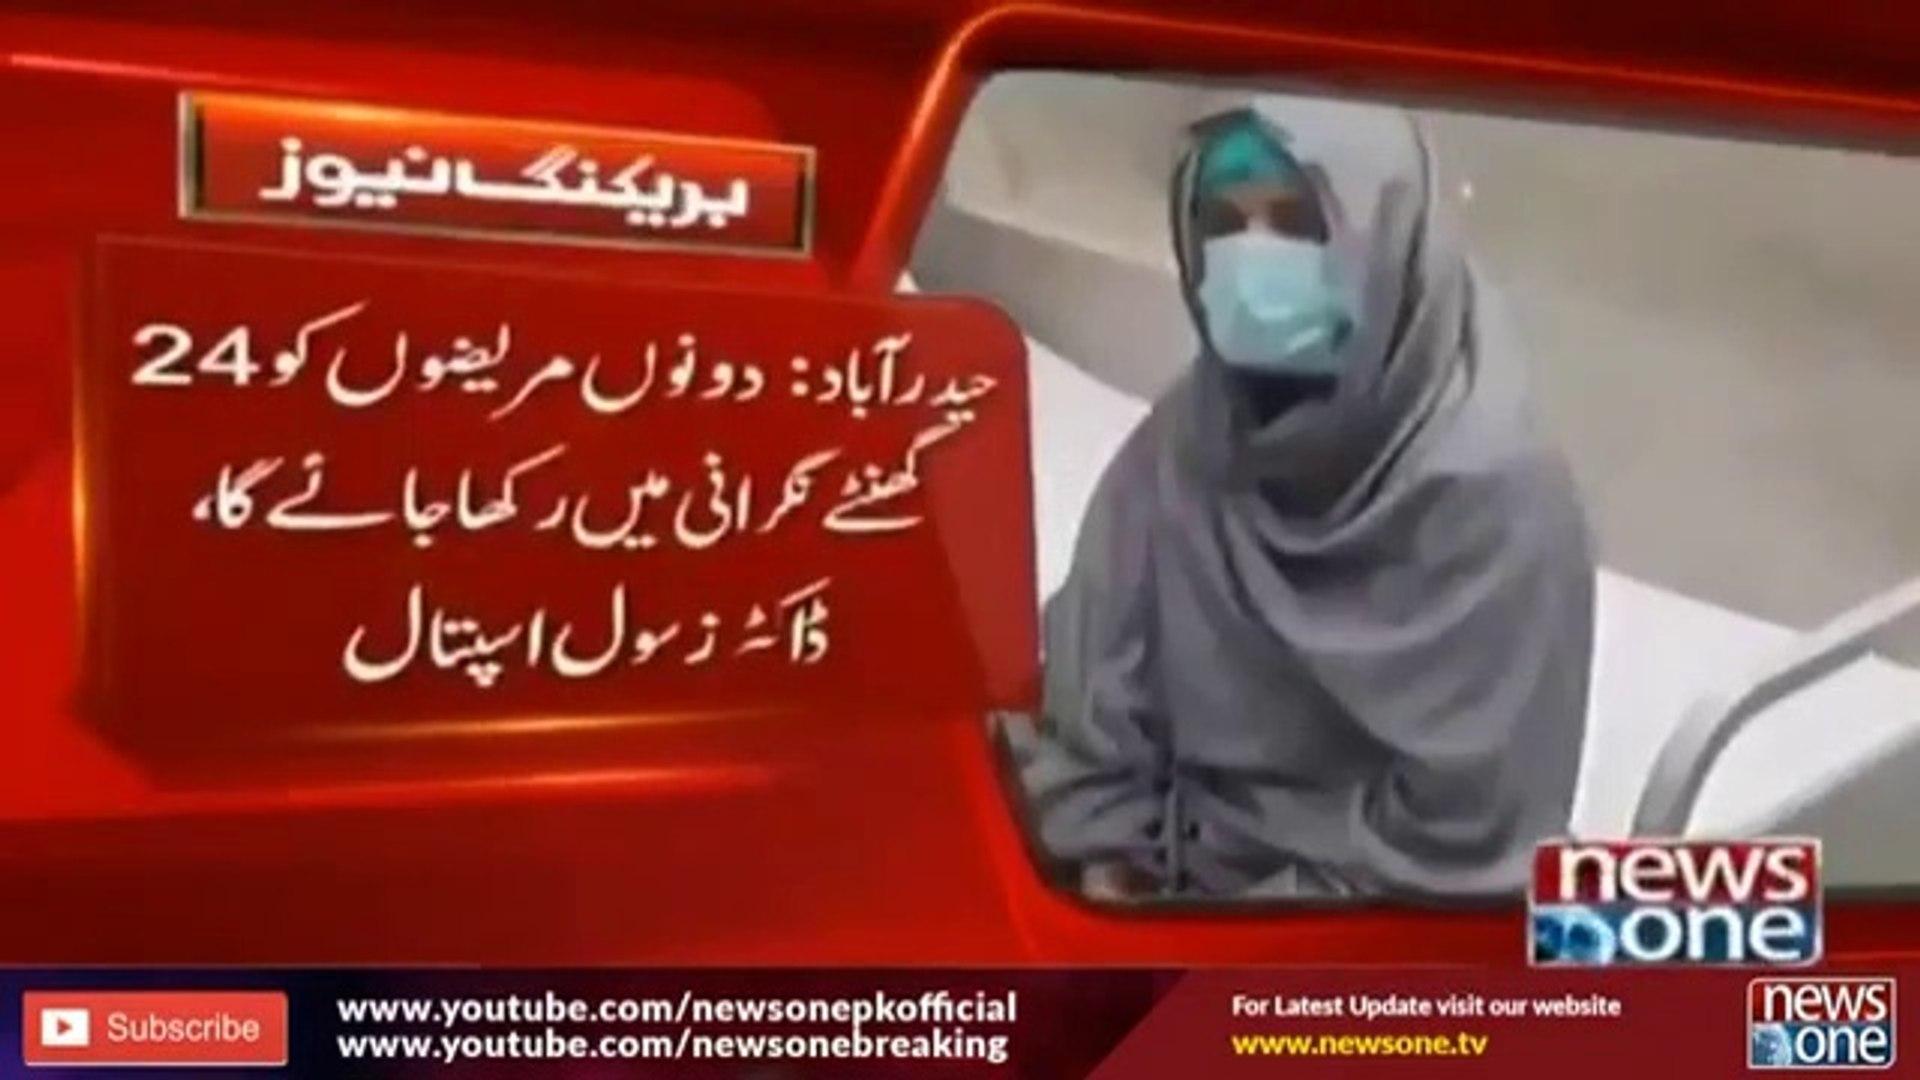 Corona virus reaches Pakistan, 2 cases diagnosed ||  Pakistani students speaks to ARY News on Corona